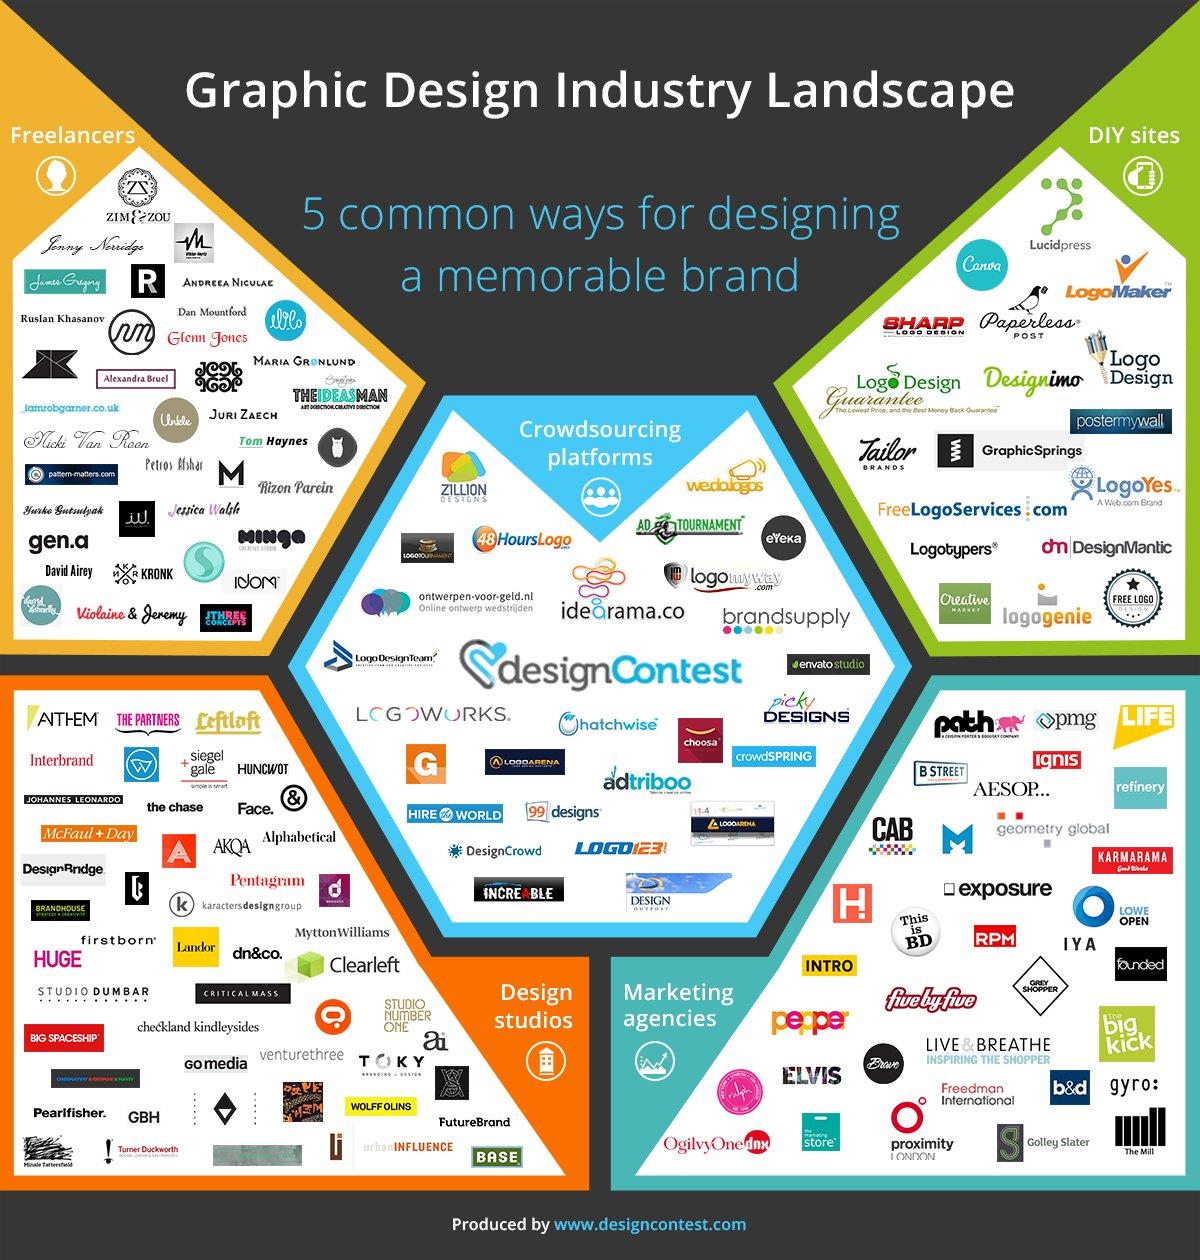 graphic design industry landscape.jpg